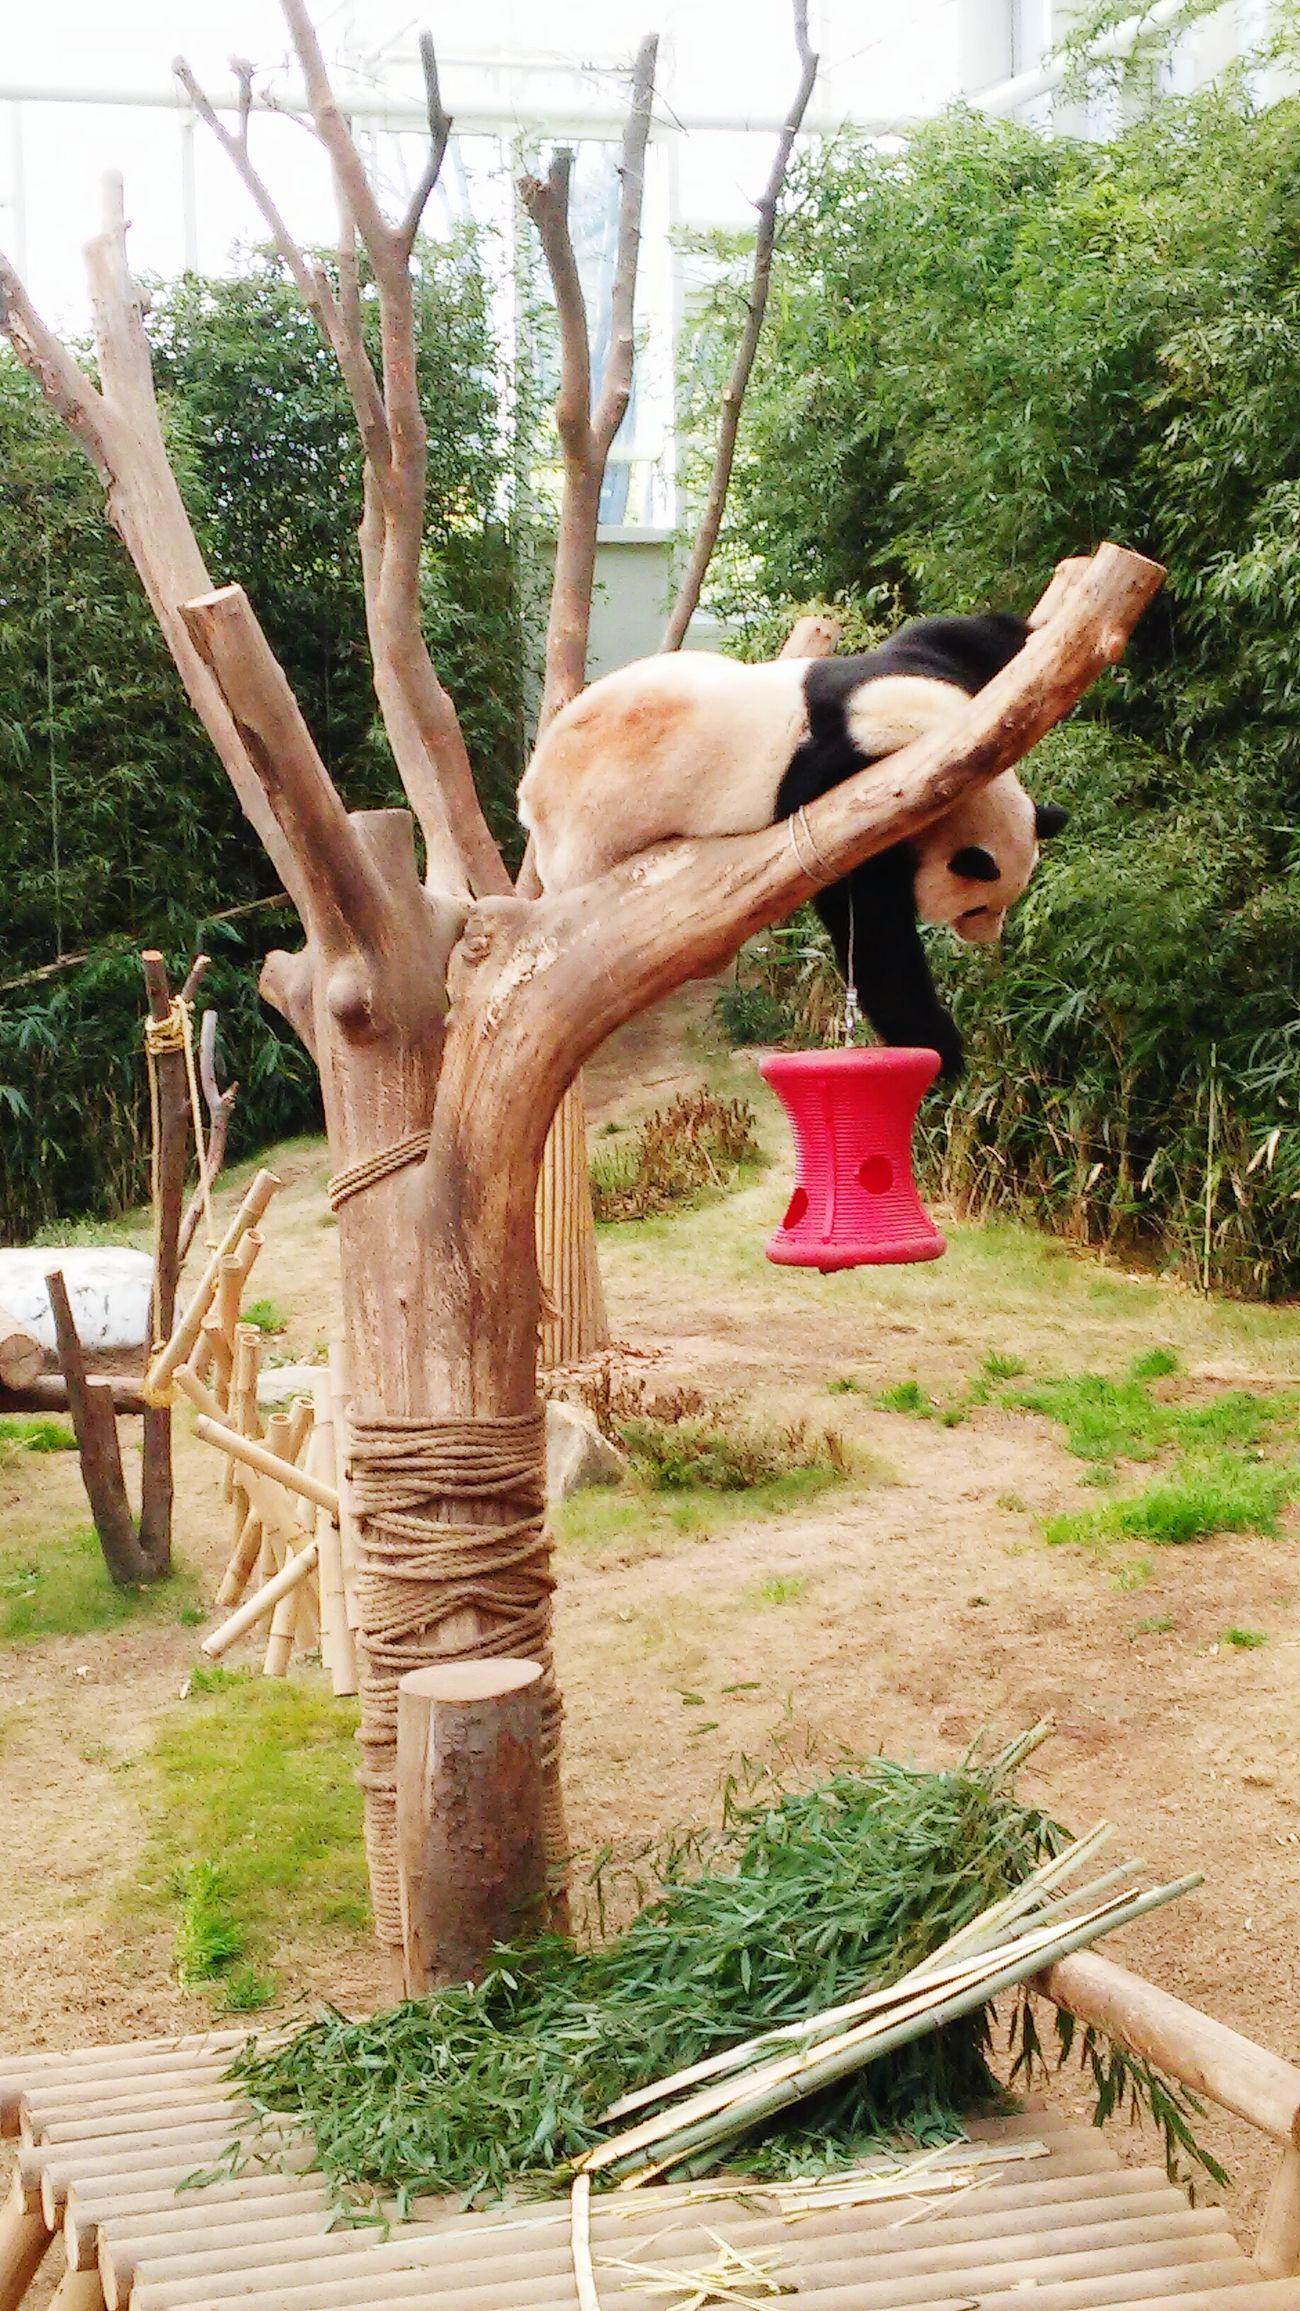 One Animal Tree Panda Animal Themes PANDA ♡♡ Pandashots Sleepyhead Tired! Sleepalldaysleepallnight Sleepanyposition